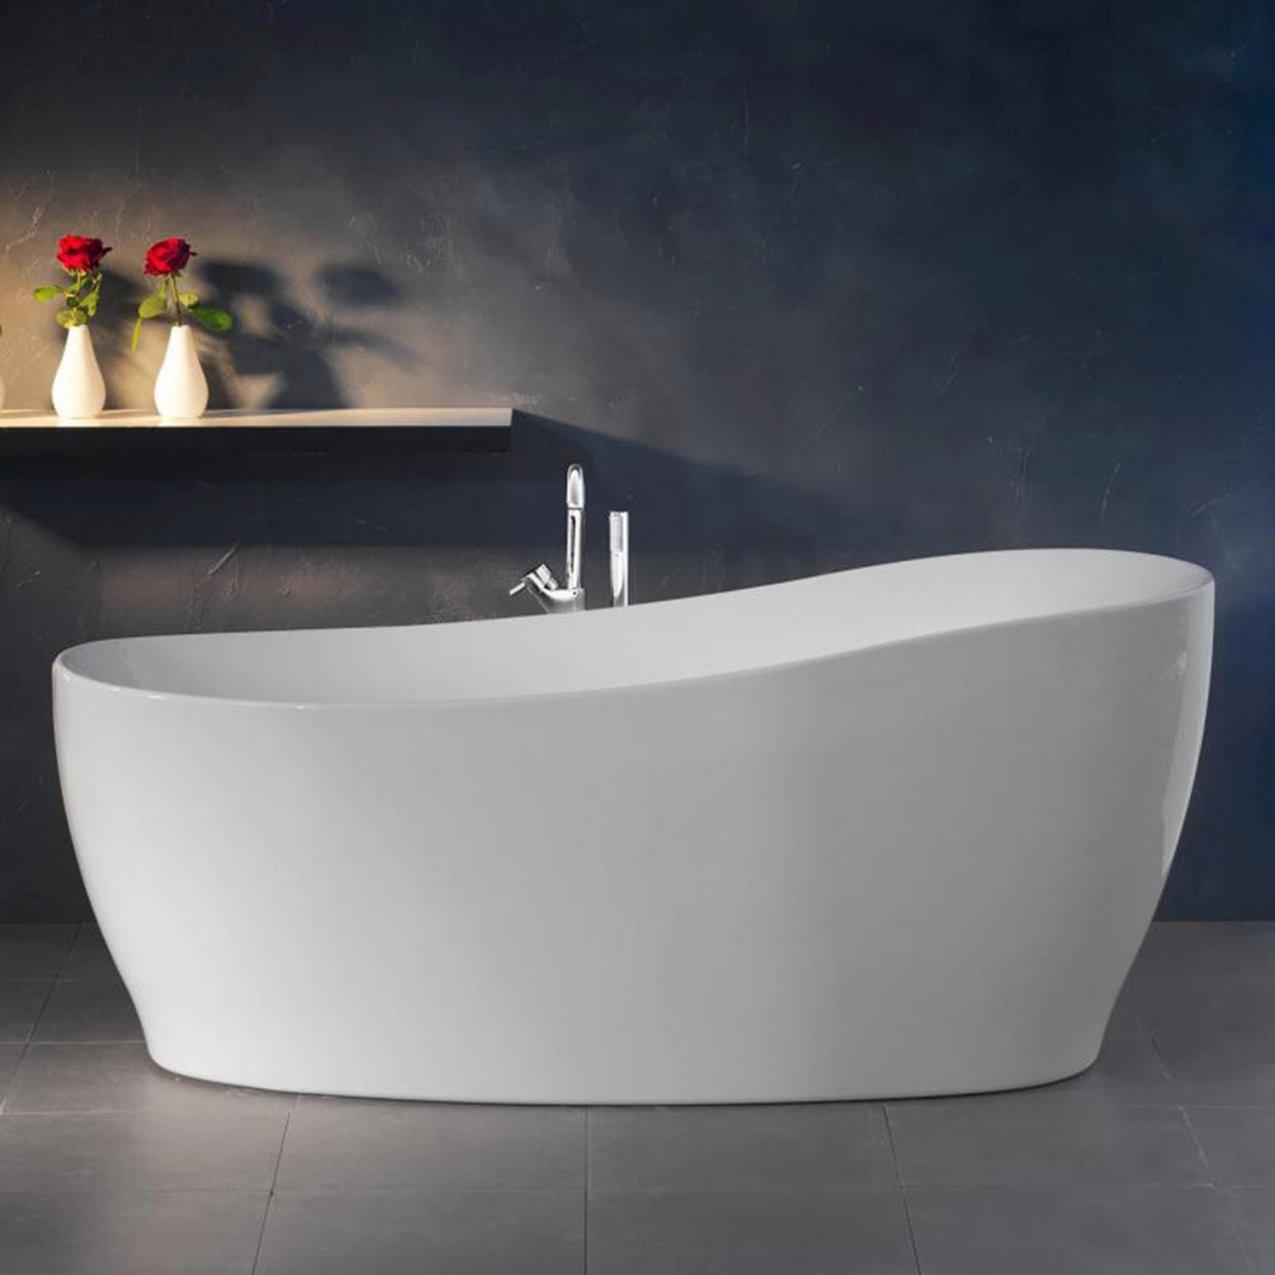 Freistehende Badewanne Aviva 180 Cm X 85 Cm Weiß Kaufen Bei Obi von Freistehende Badewanne Bilder Photo